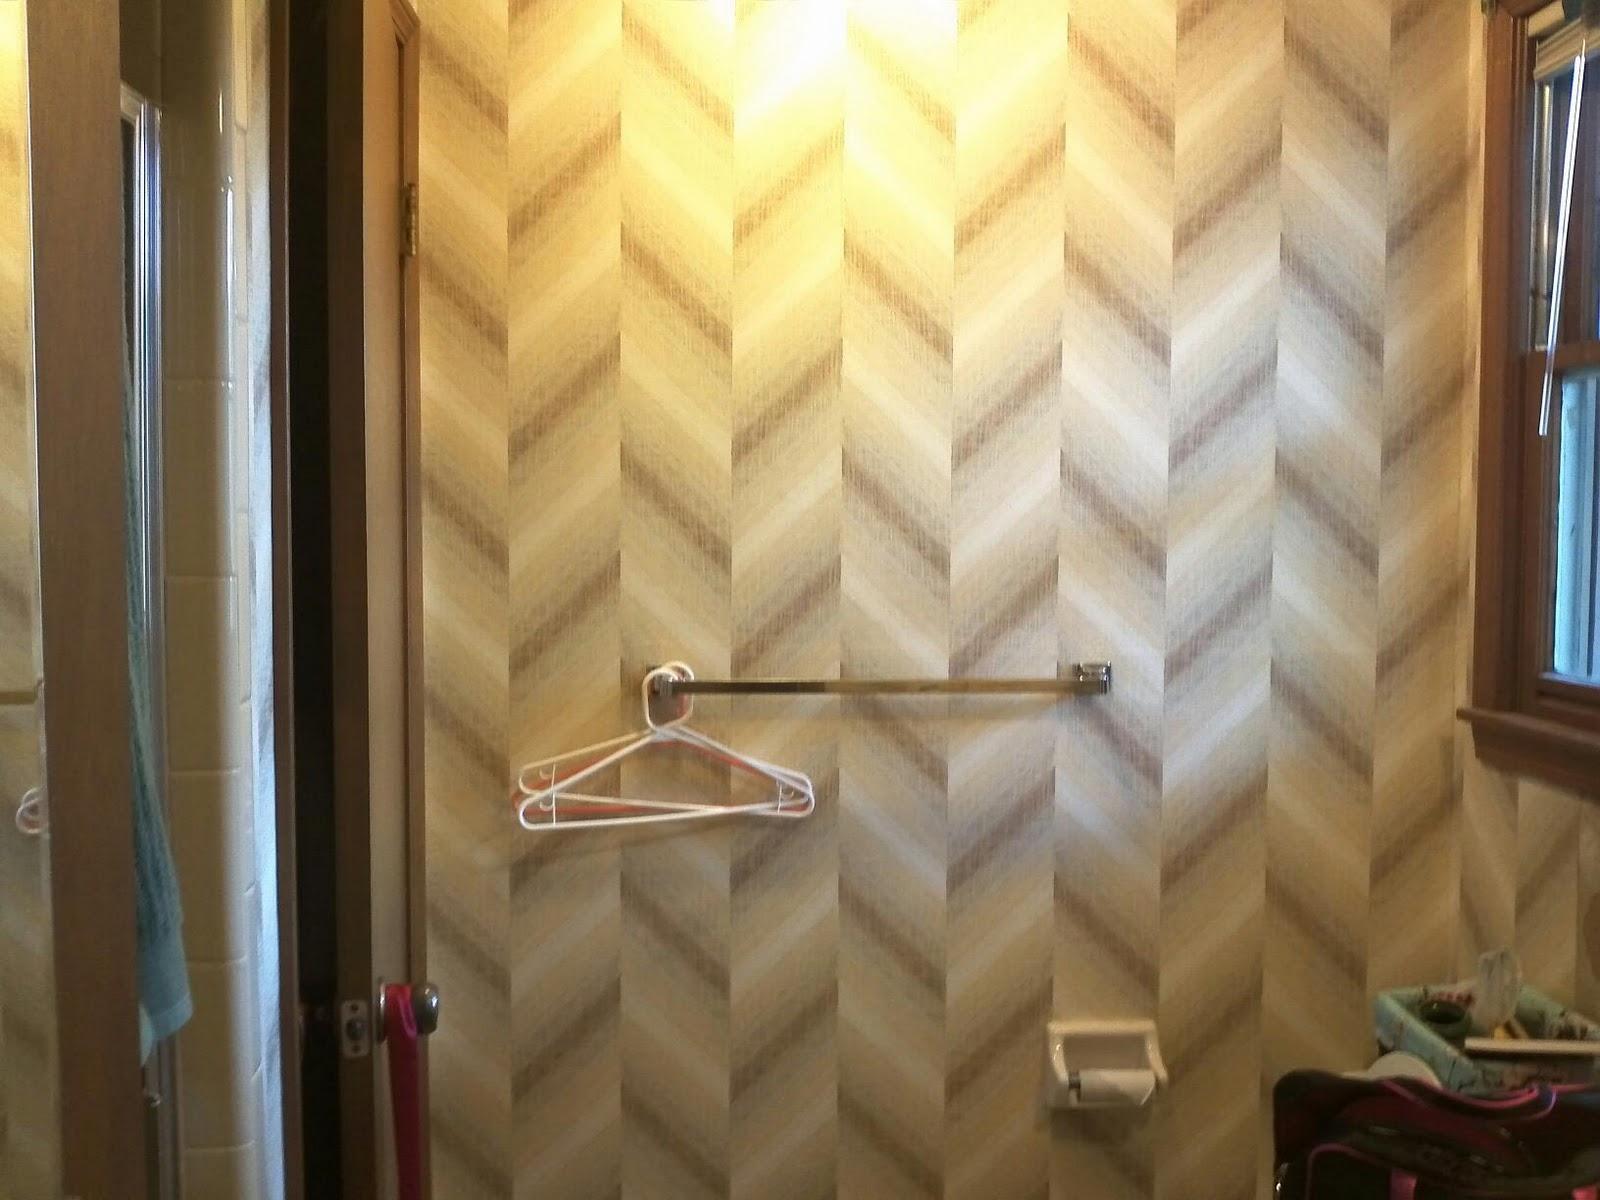 http://1.bp.blogspot.com/-xASwS0tyACw/TtL0gbK4vNI/AAAAAAAABqs/kBn6gnNueZI/s1600/bathroom-wallpaper.jpg